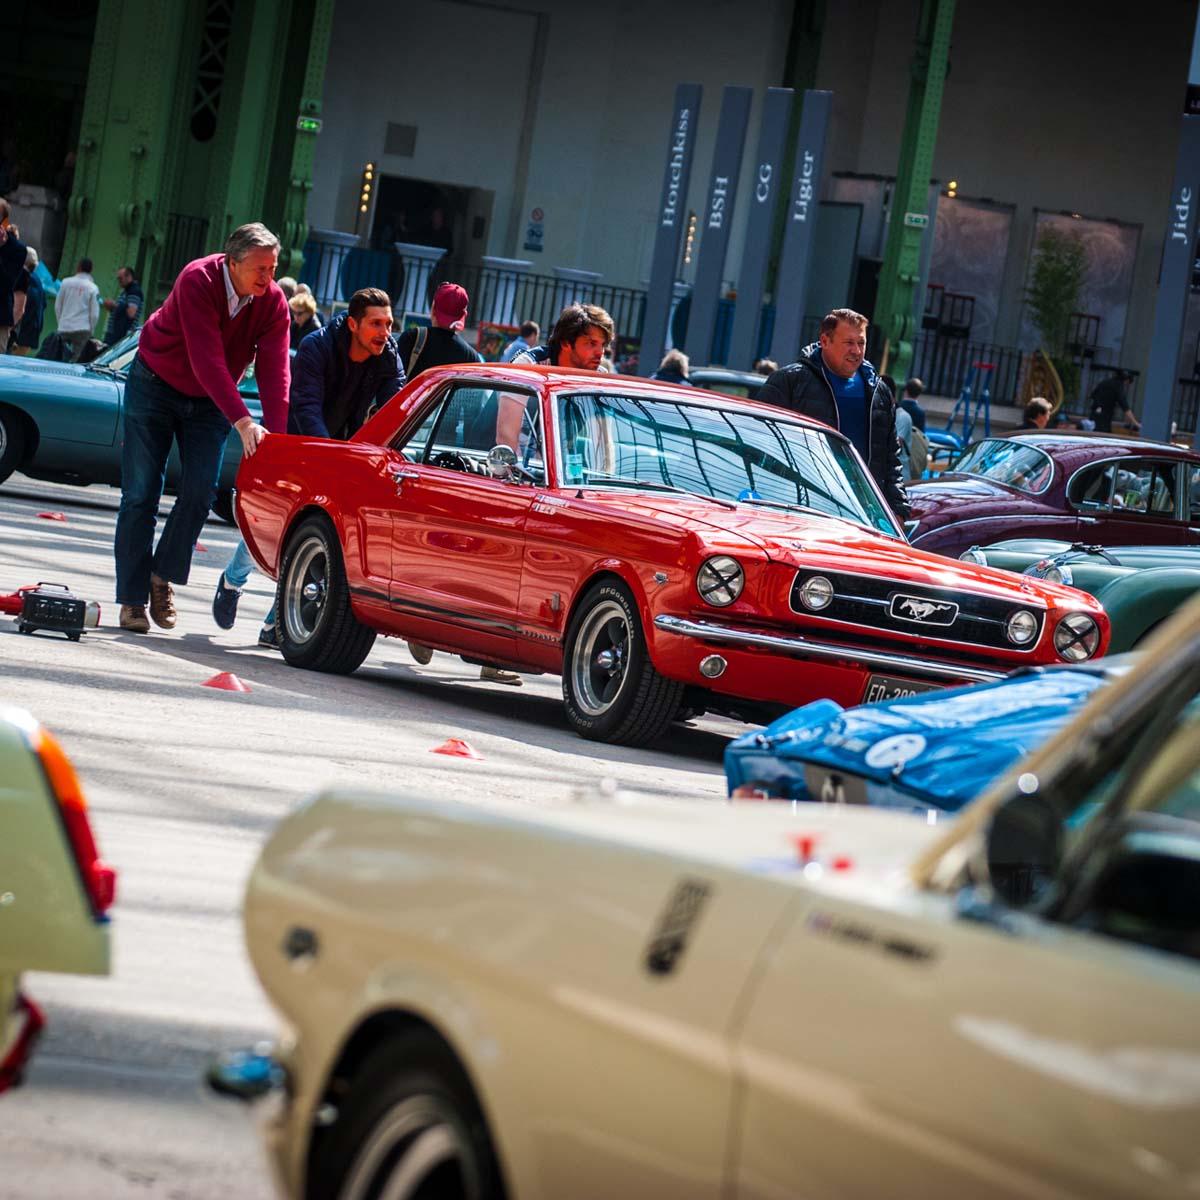 La Cote des Montres : Photo - Zenith Tour Auto Optic 2ooo (24-30 avril 2017)